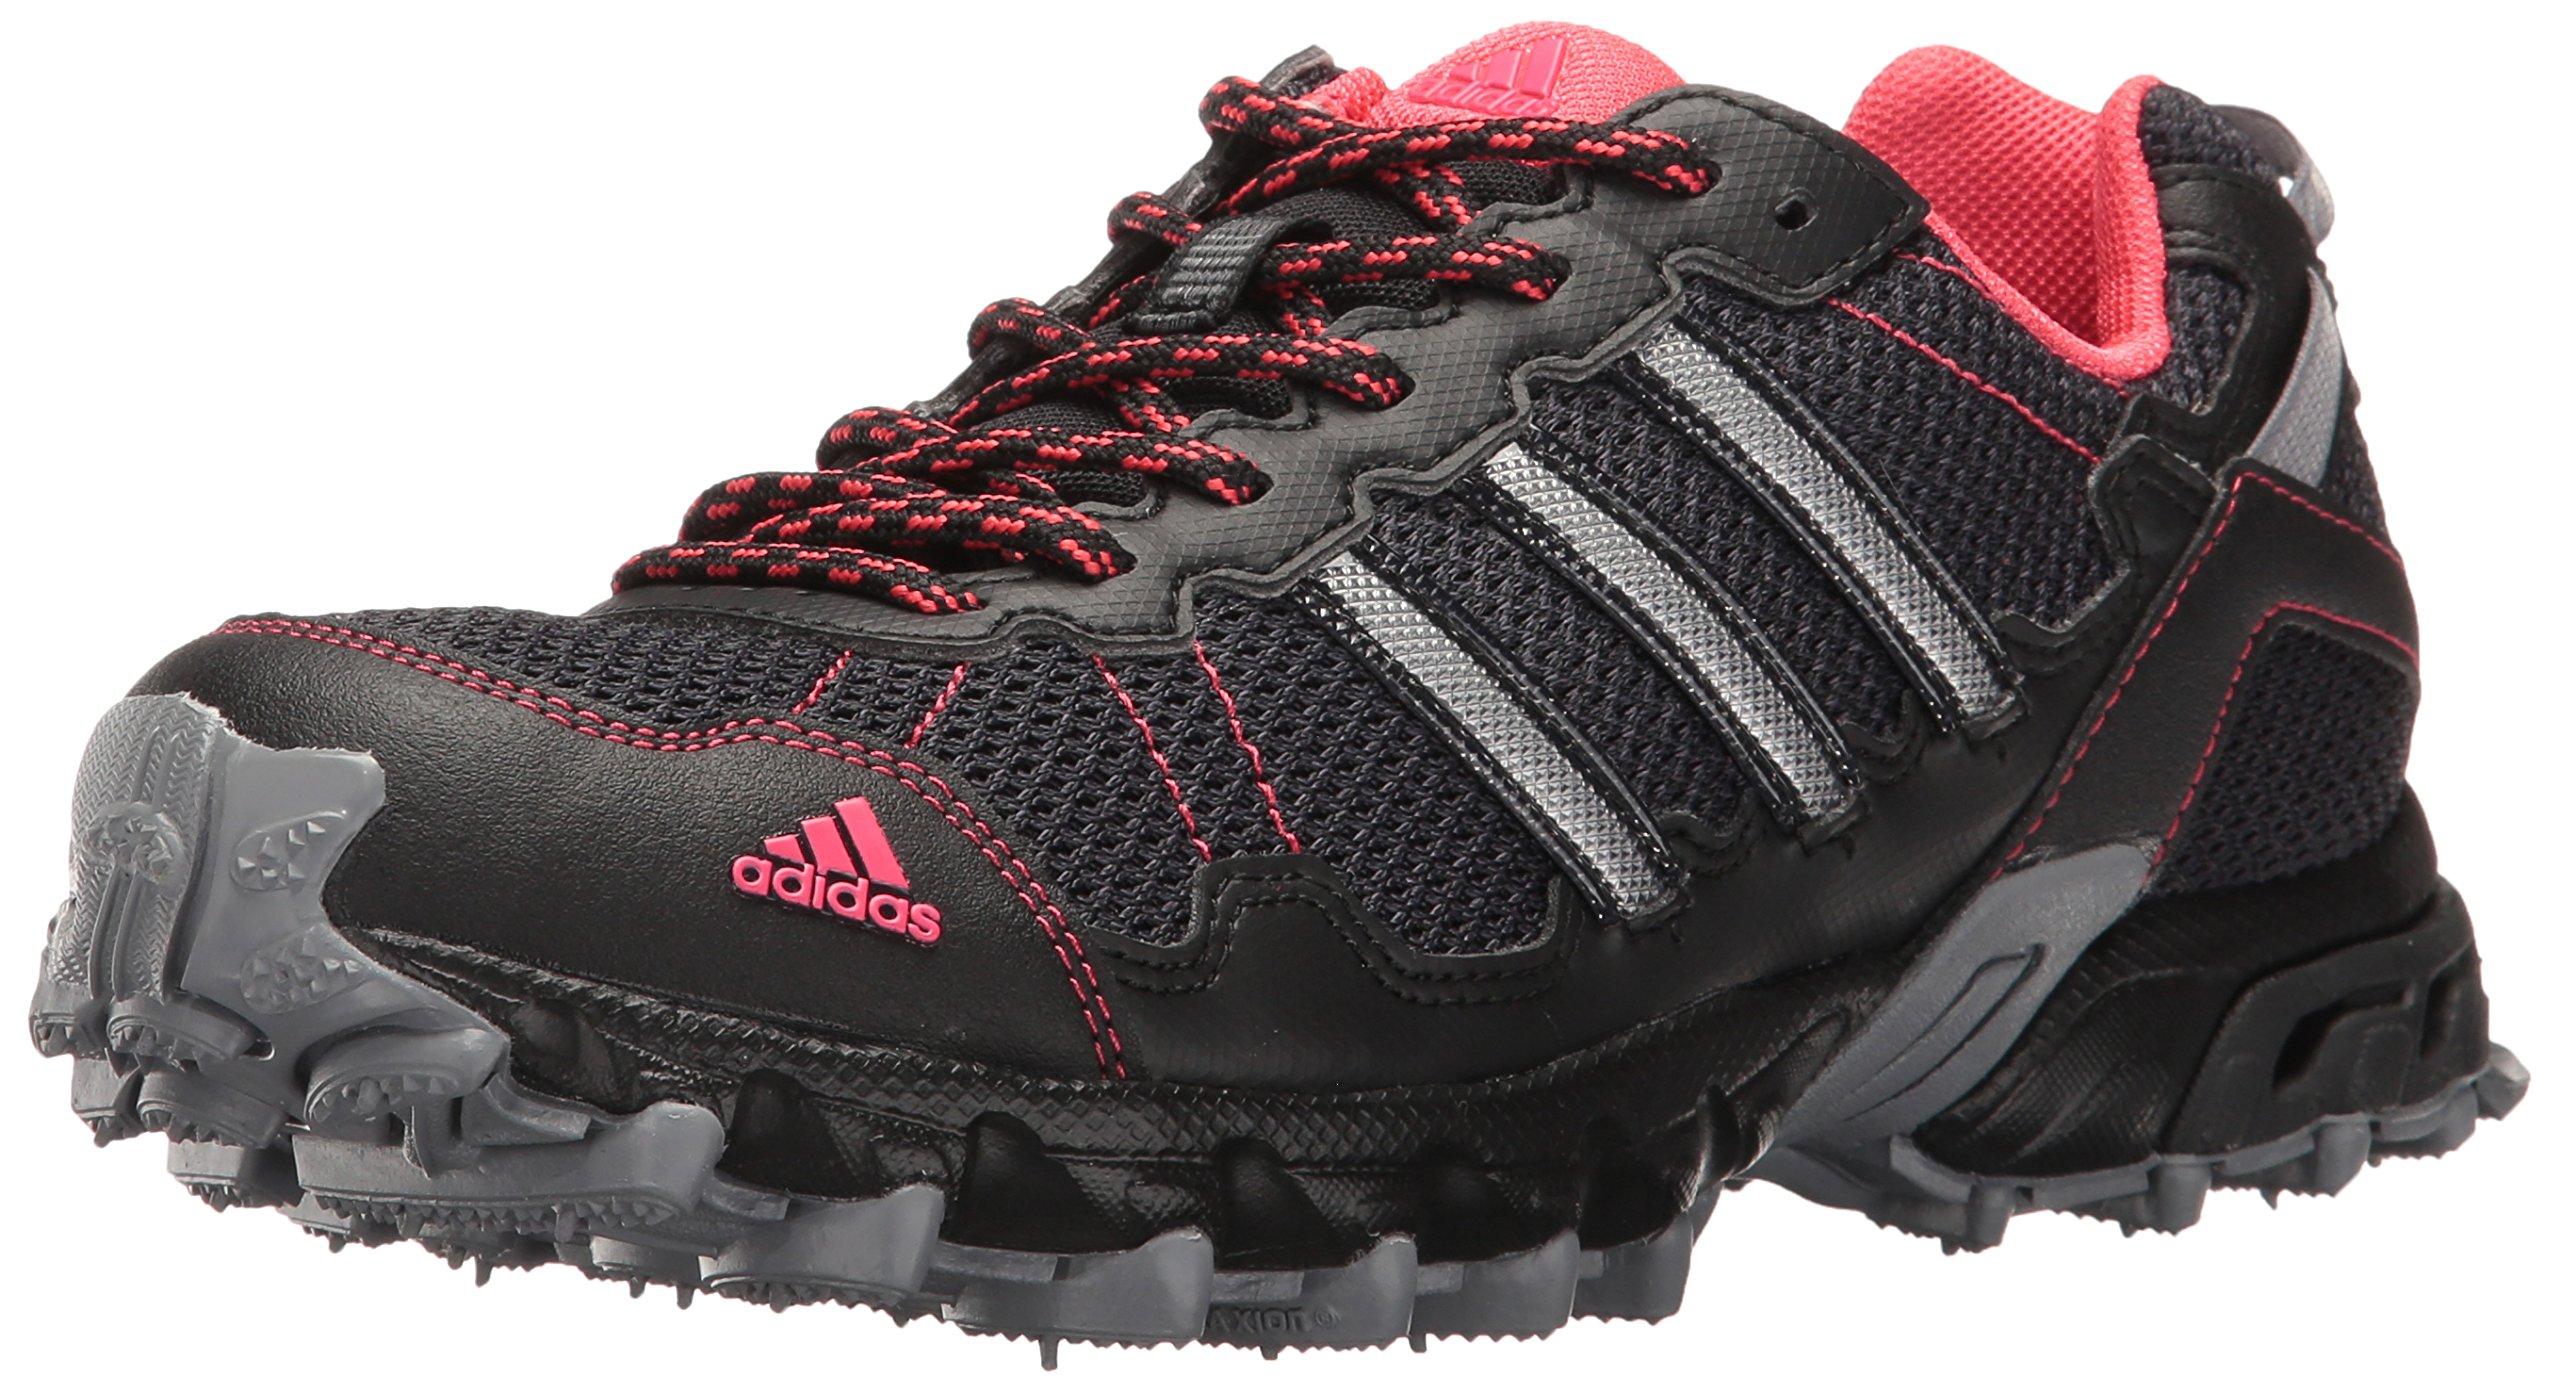 adidas Women's Rockadia Trail W Running Shoe Grey/Black/Pink 7 M US by adidas (Image #1)